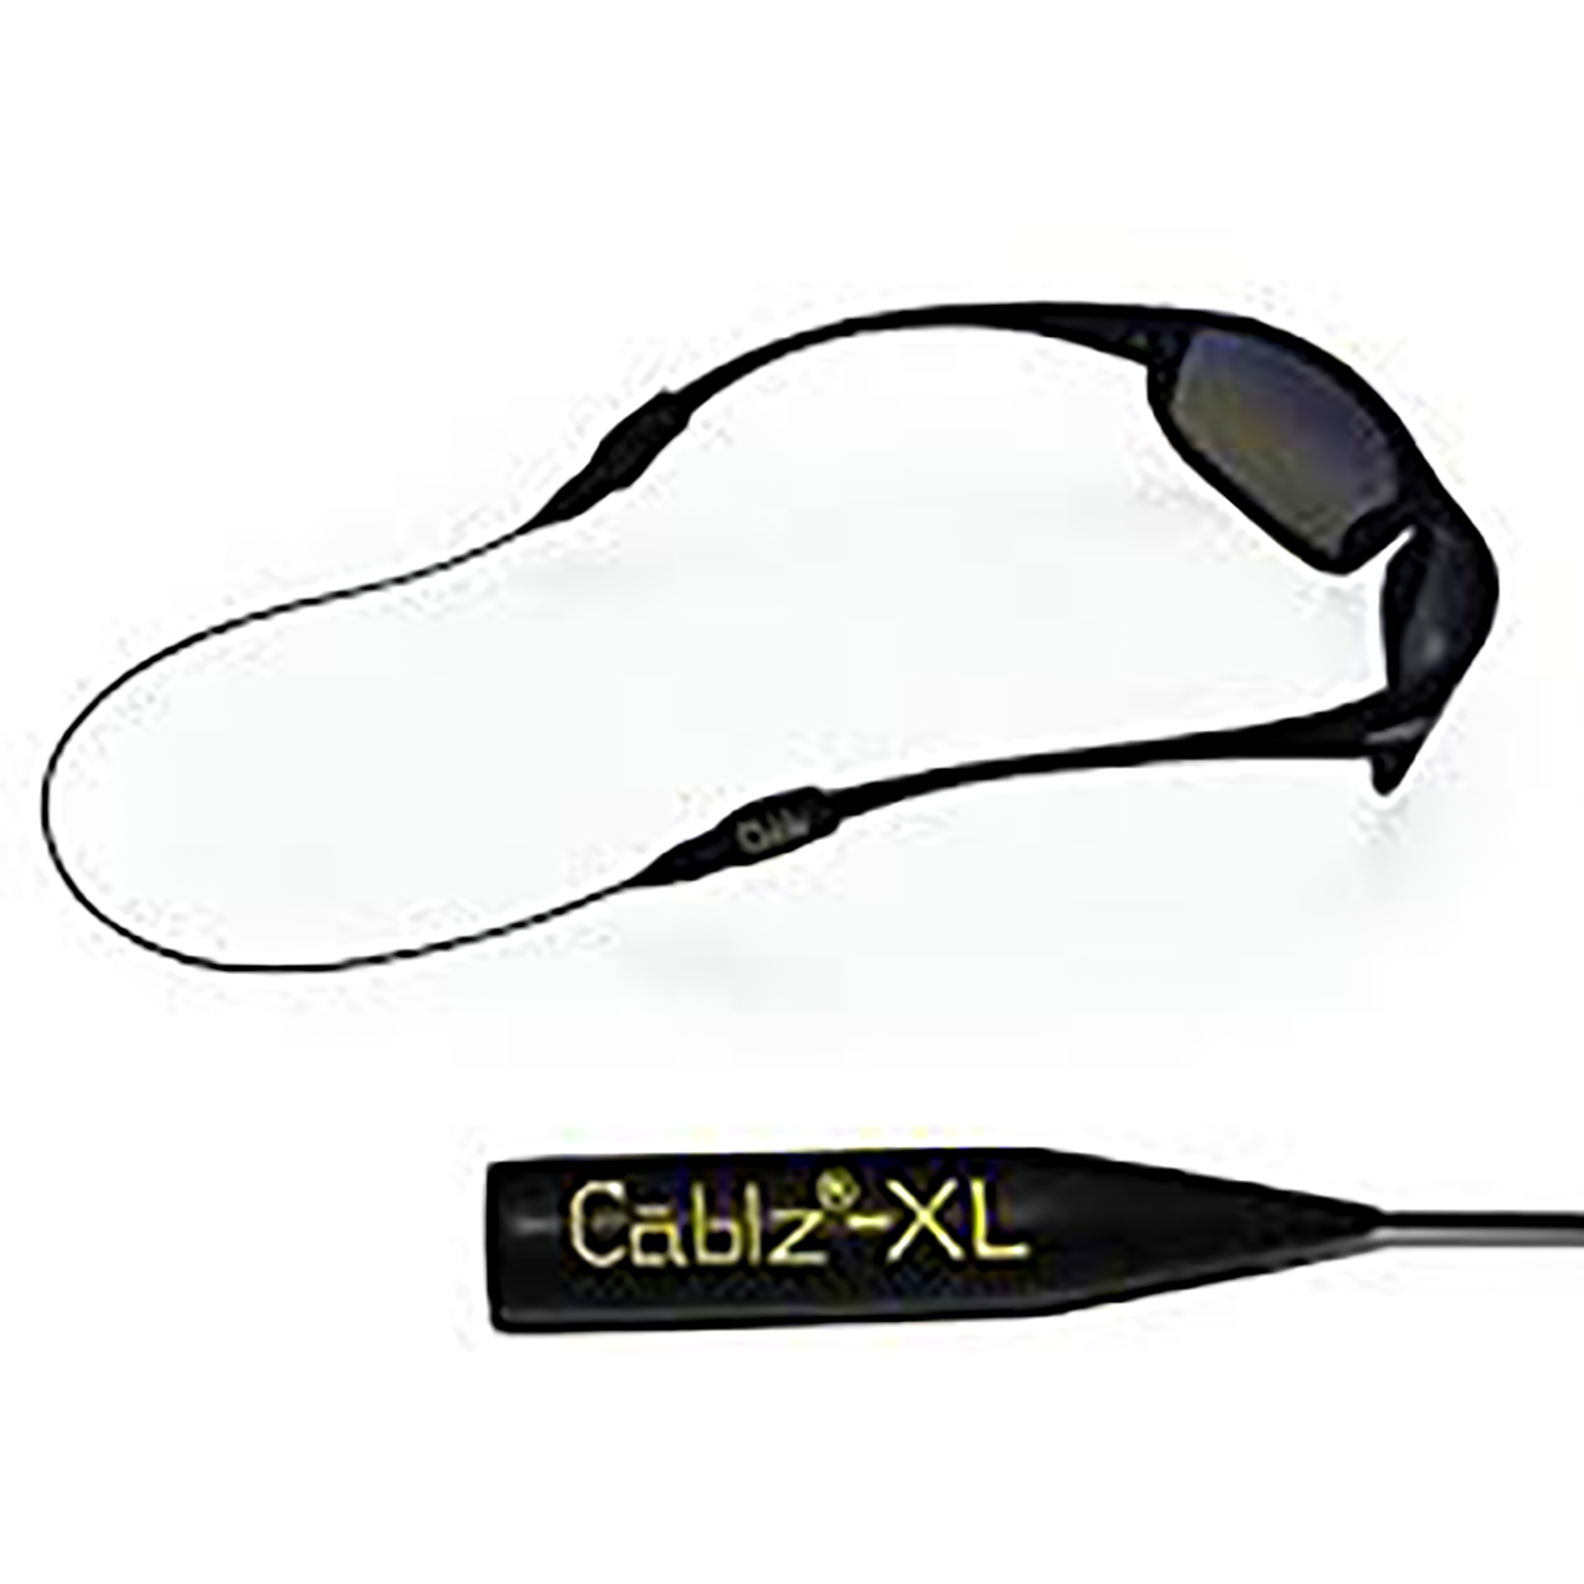 "Zipz 14"" Eyewear Retainer XL FOR LARGER FRAMES-1"